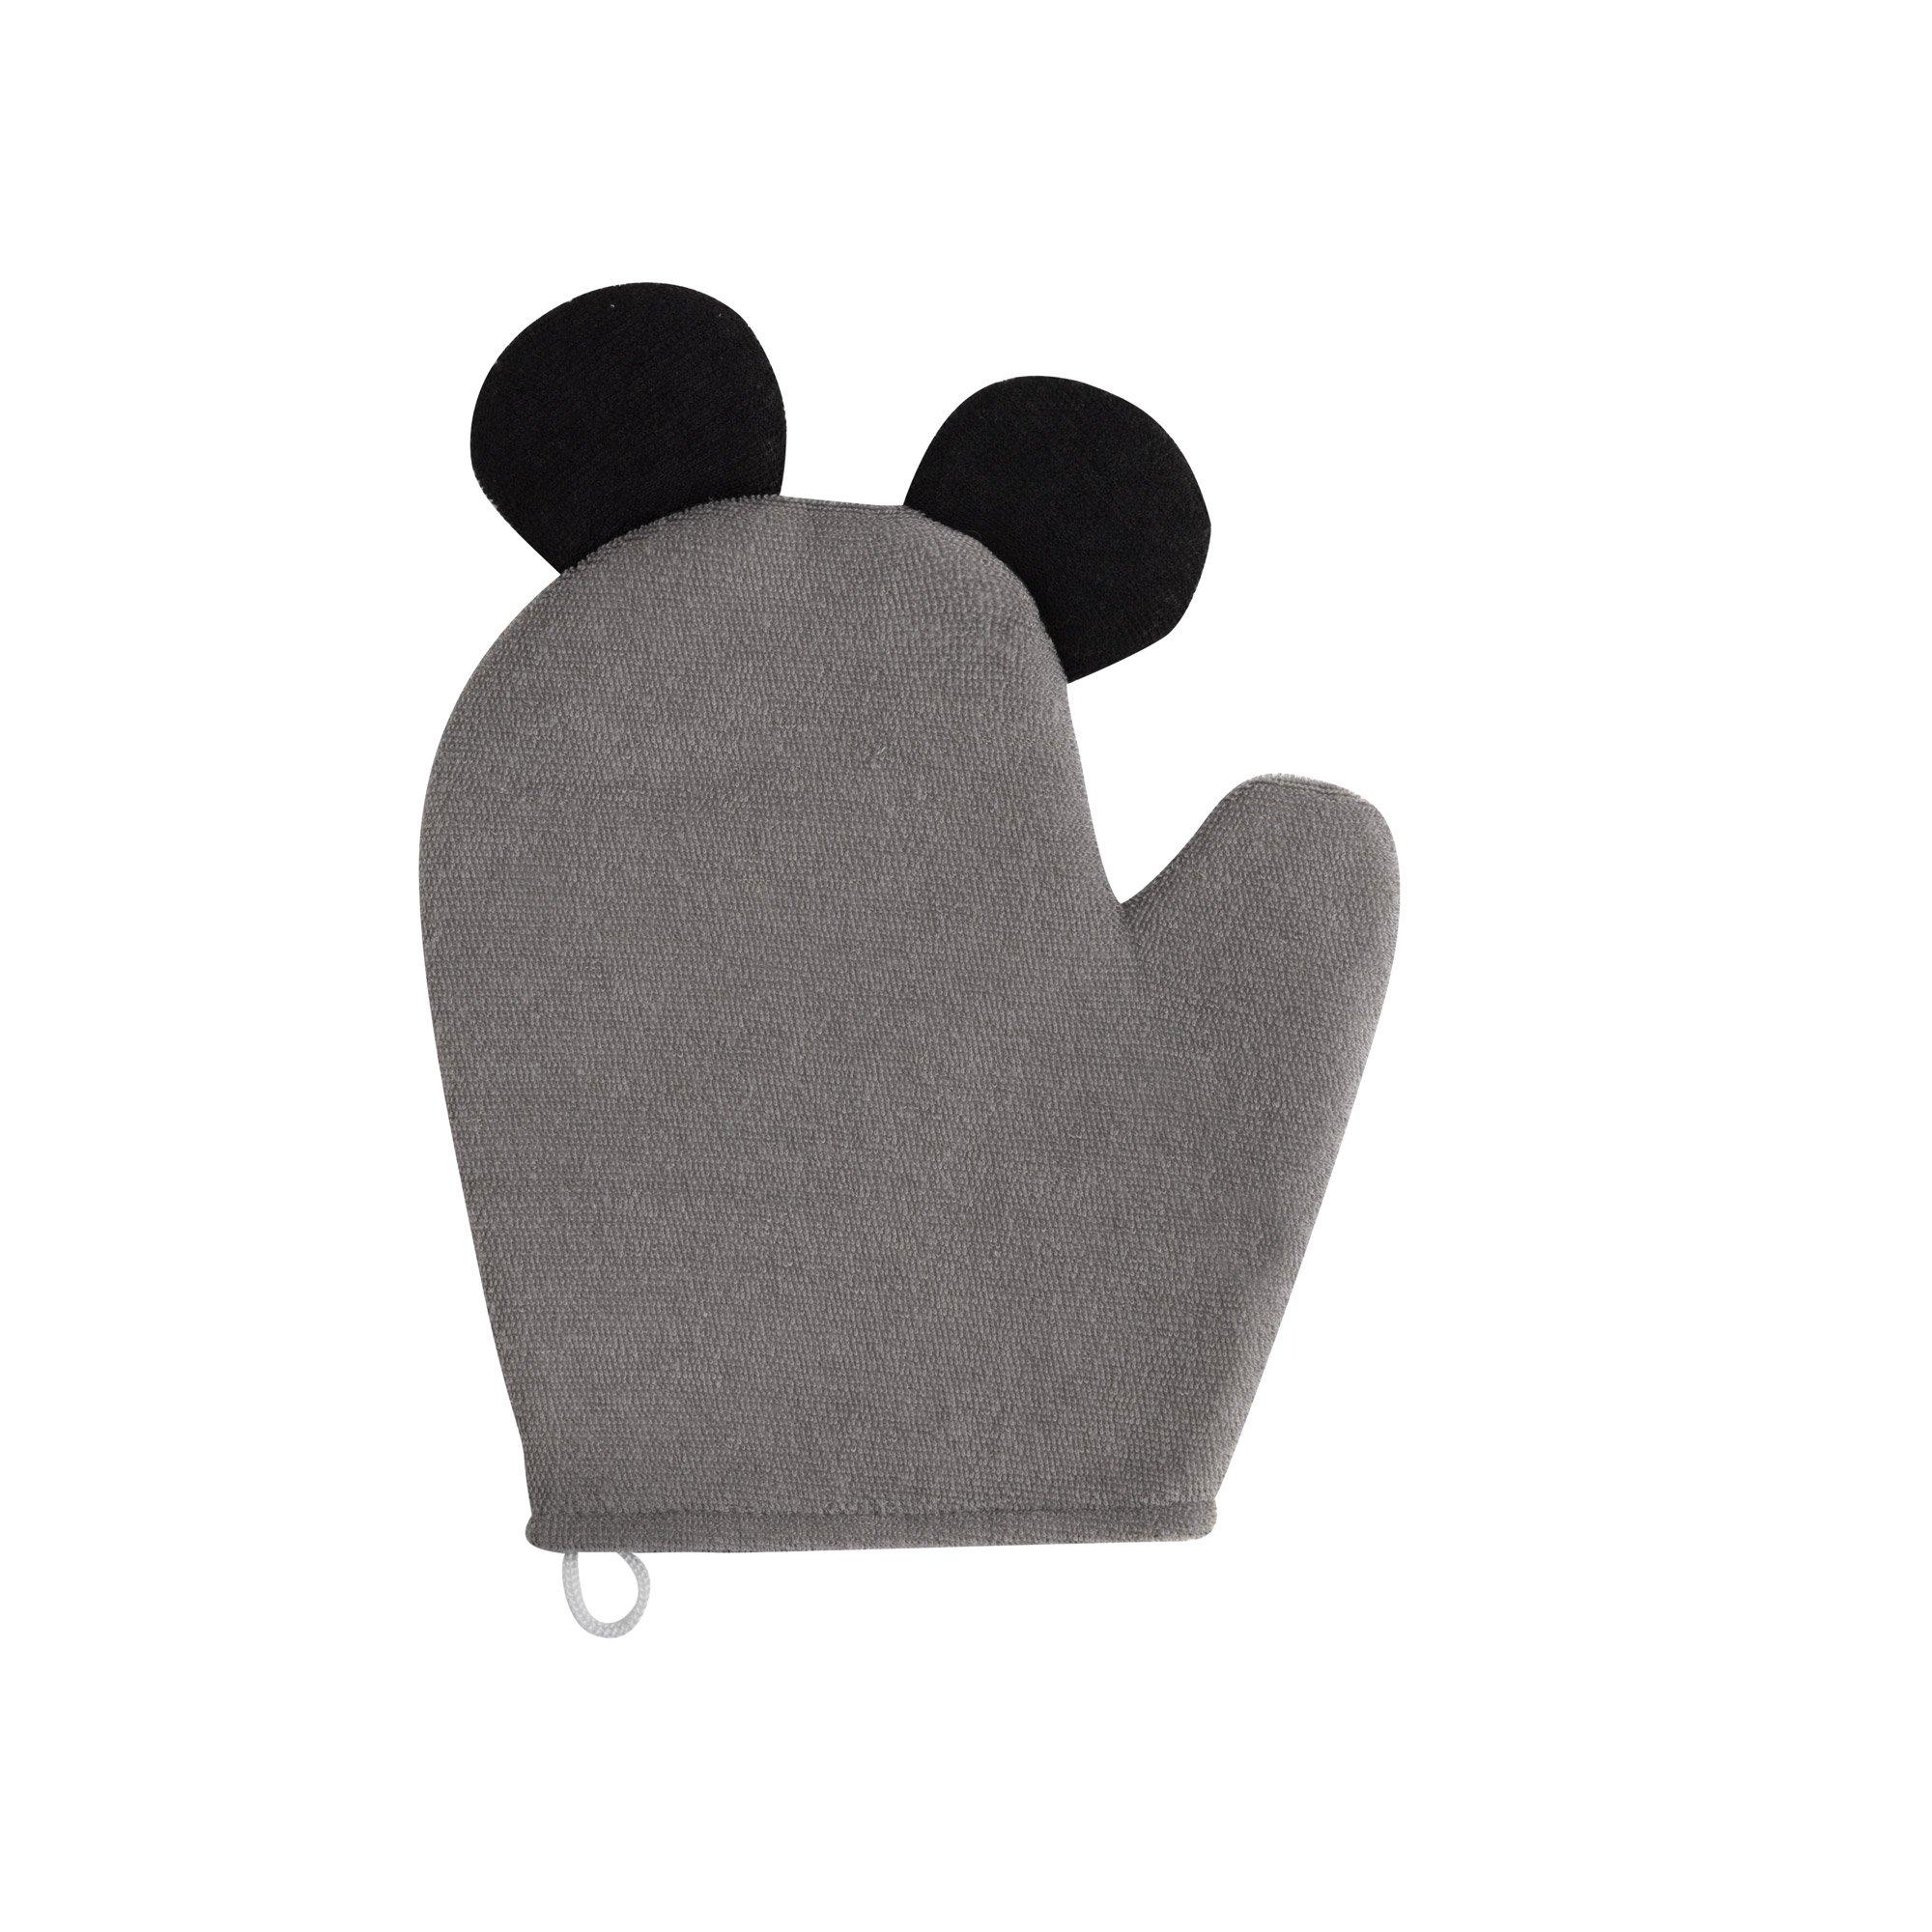 Gant de toilette Mickey  de Aubert concept